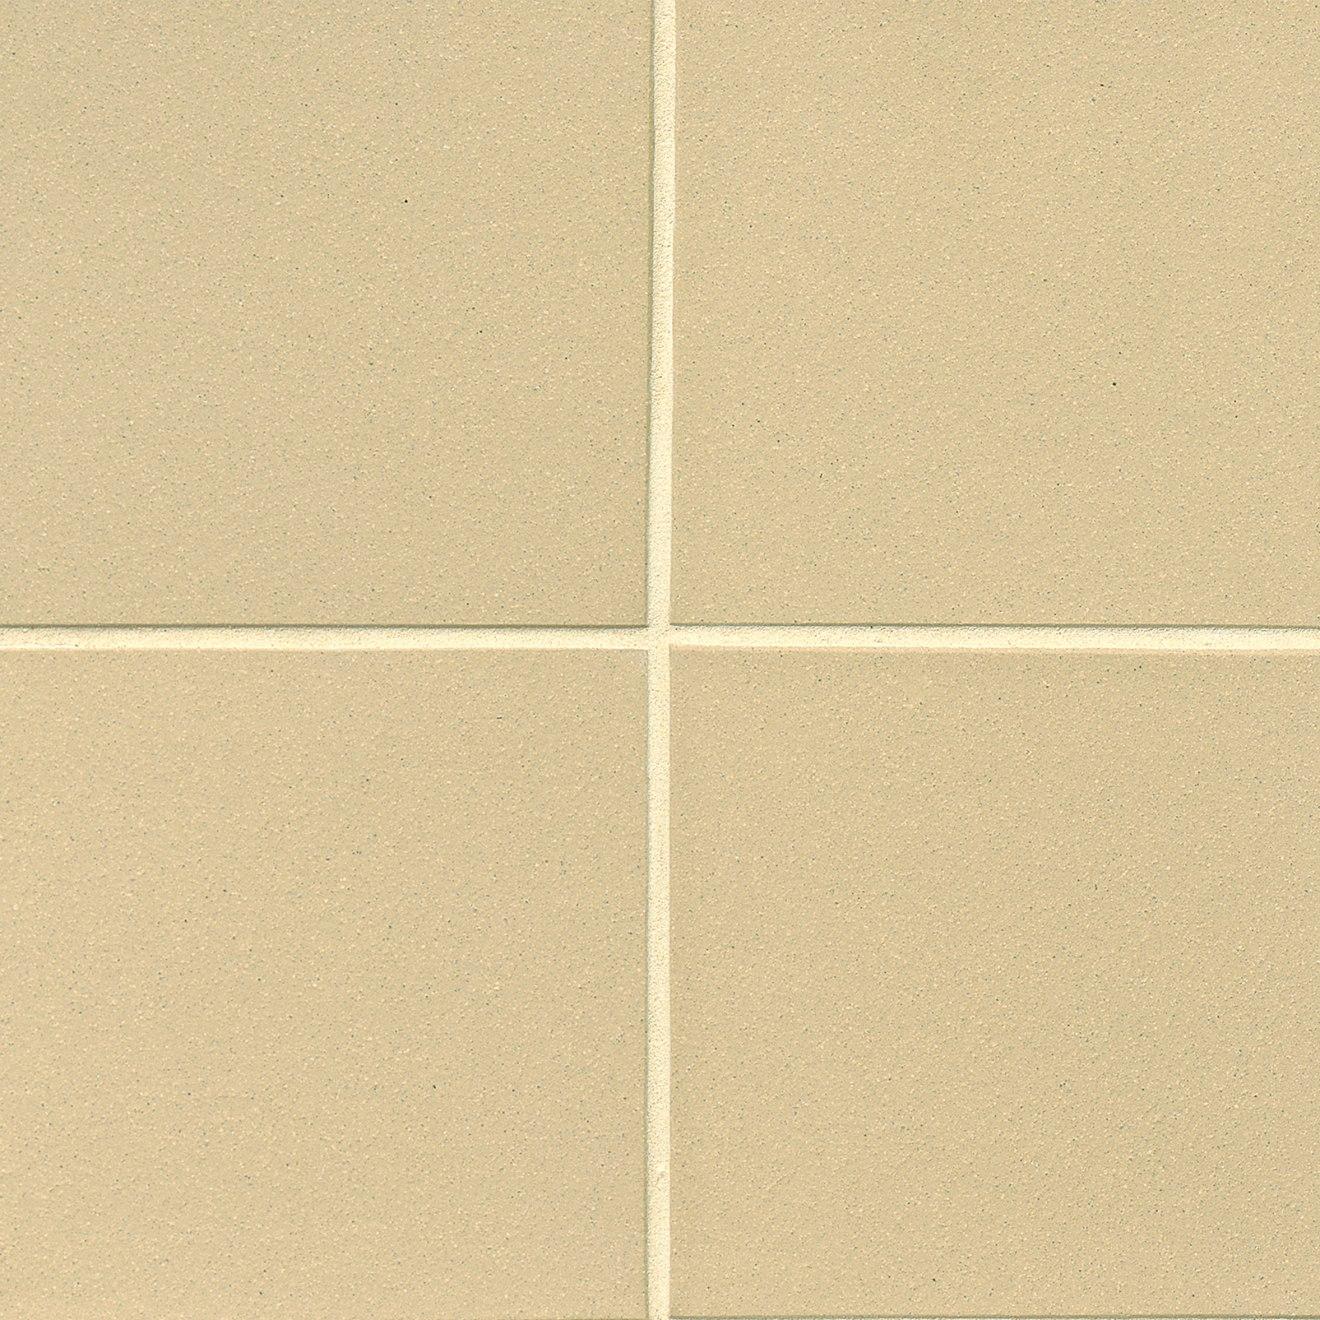 Magnificent 12X12 Cork Floor Tiles Thin 16 Ceramic Tile Square 16X32 Ceiling Tiles 18X18 Ceramic Floor Tile Old 2 X4 Ceiling Tiles Blue24X24 Ceiling Tiles QUARRY   OYSTER BAY FIELD 8X8